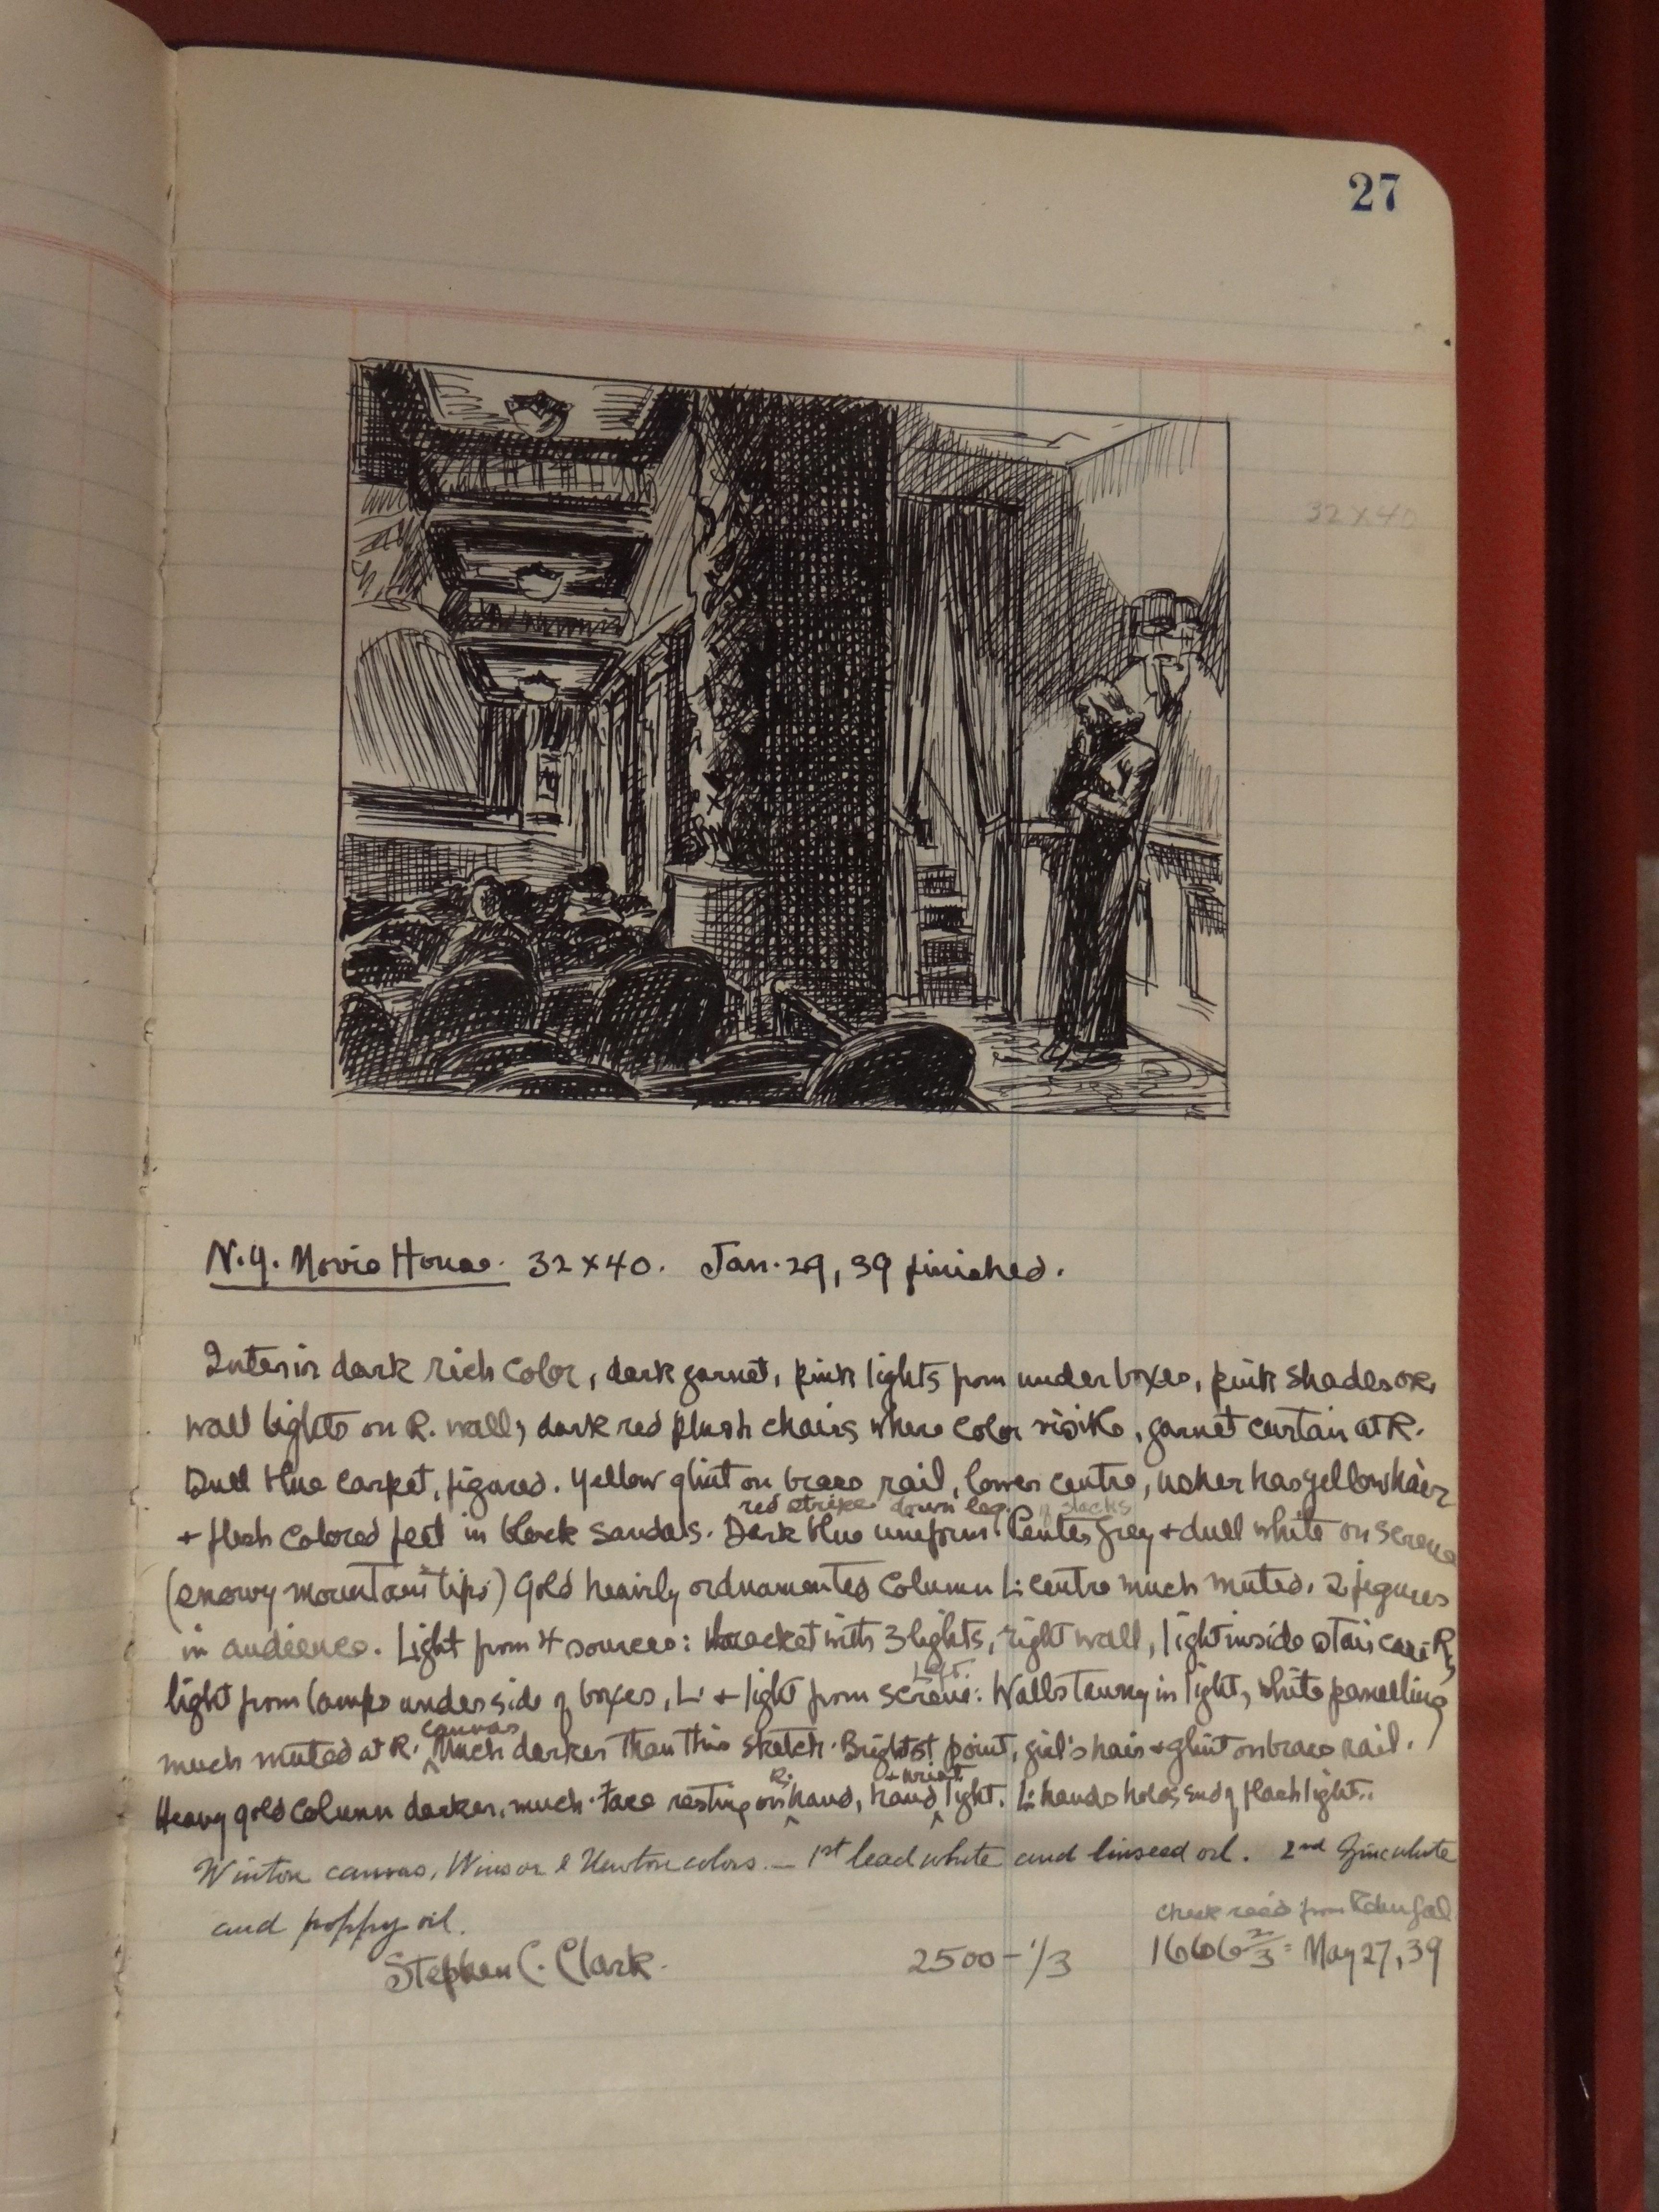 Edward Hopper notebook, New York Movie, Jan. 29 1939